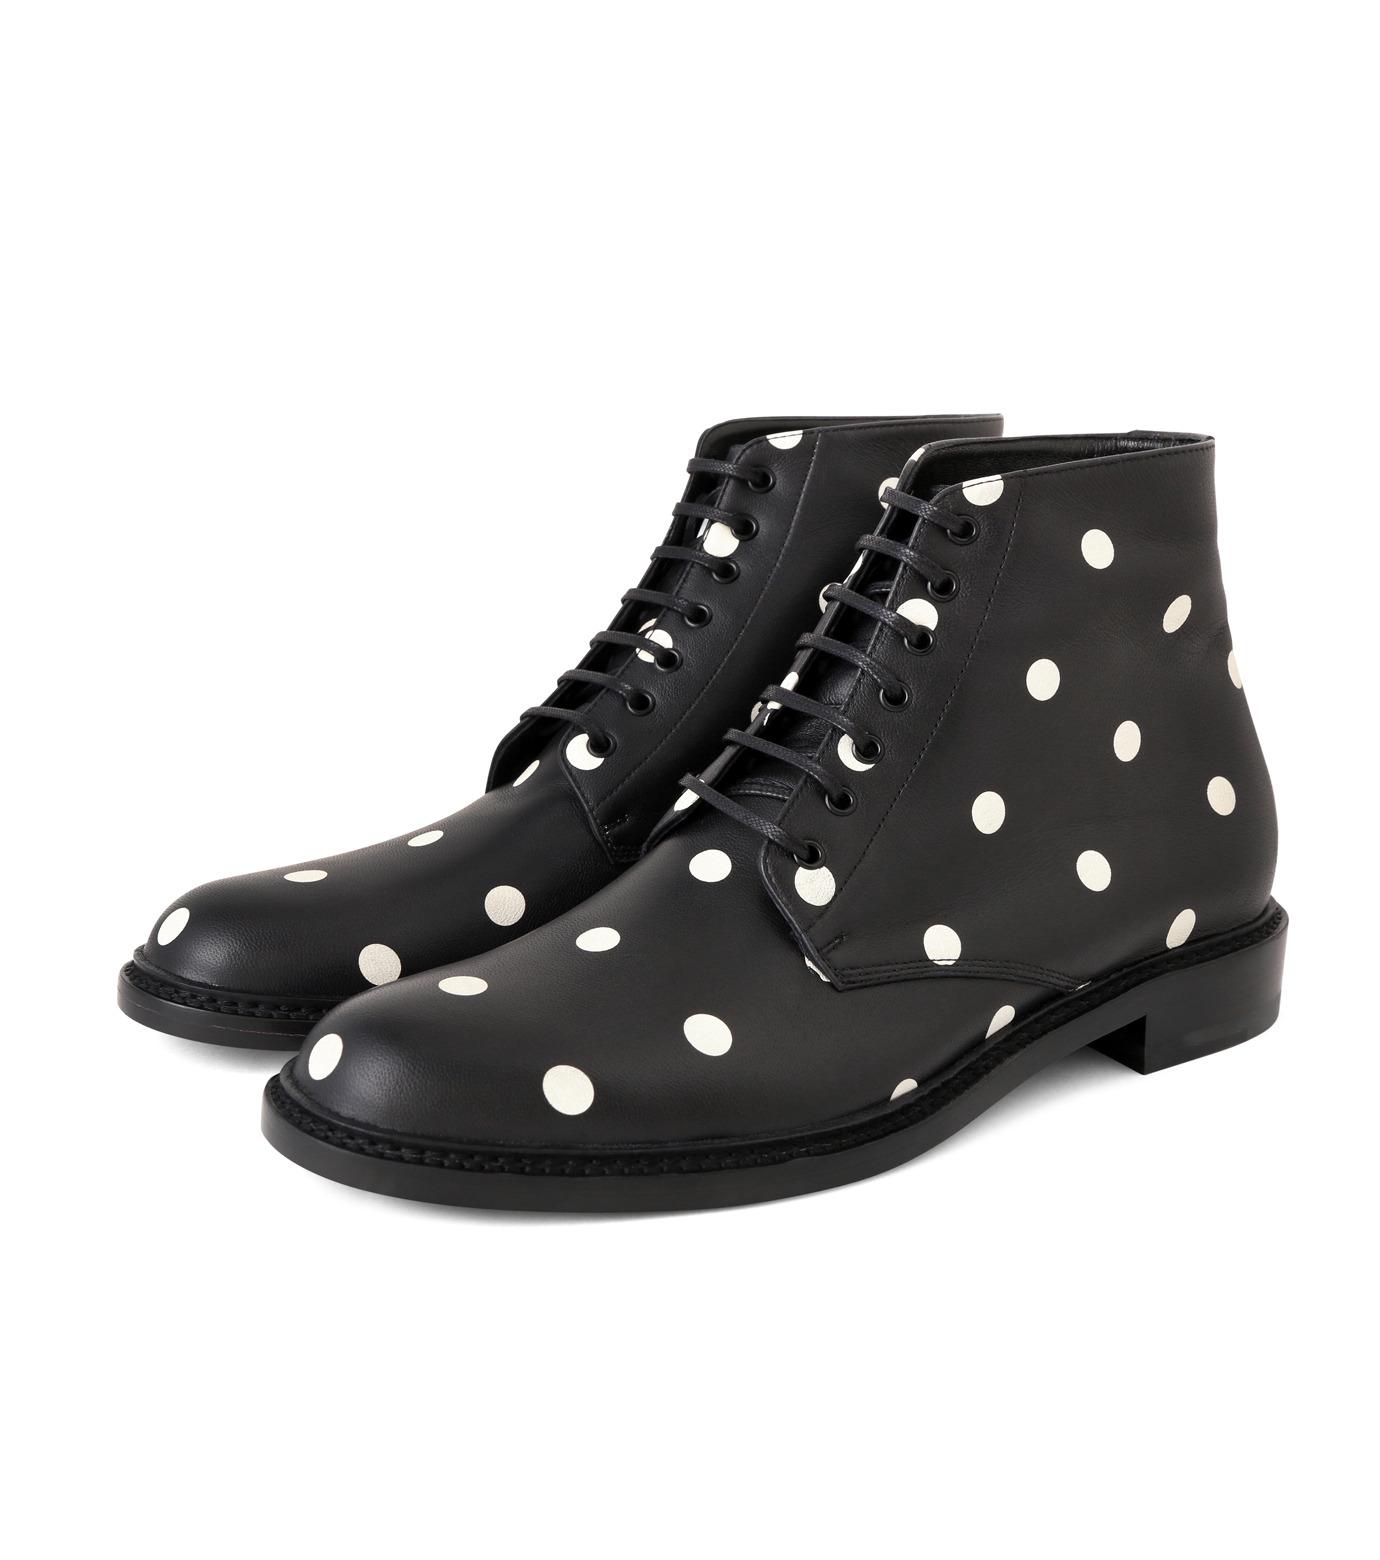 SAINT LAURENT(サンローラン)のLolita Lace Up Boots Dots-BLACK(ブーツ/boots)-417667-CZC00-13 拡大詳細画像3